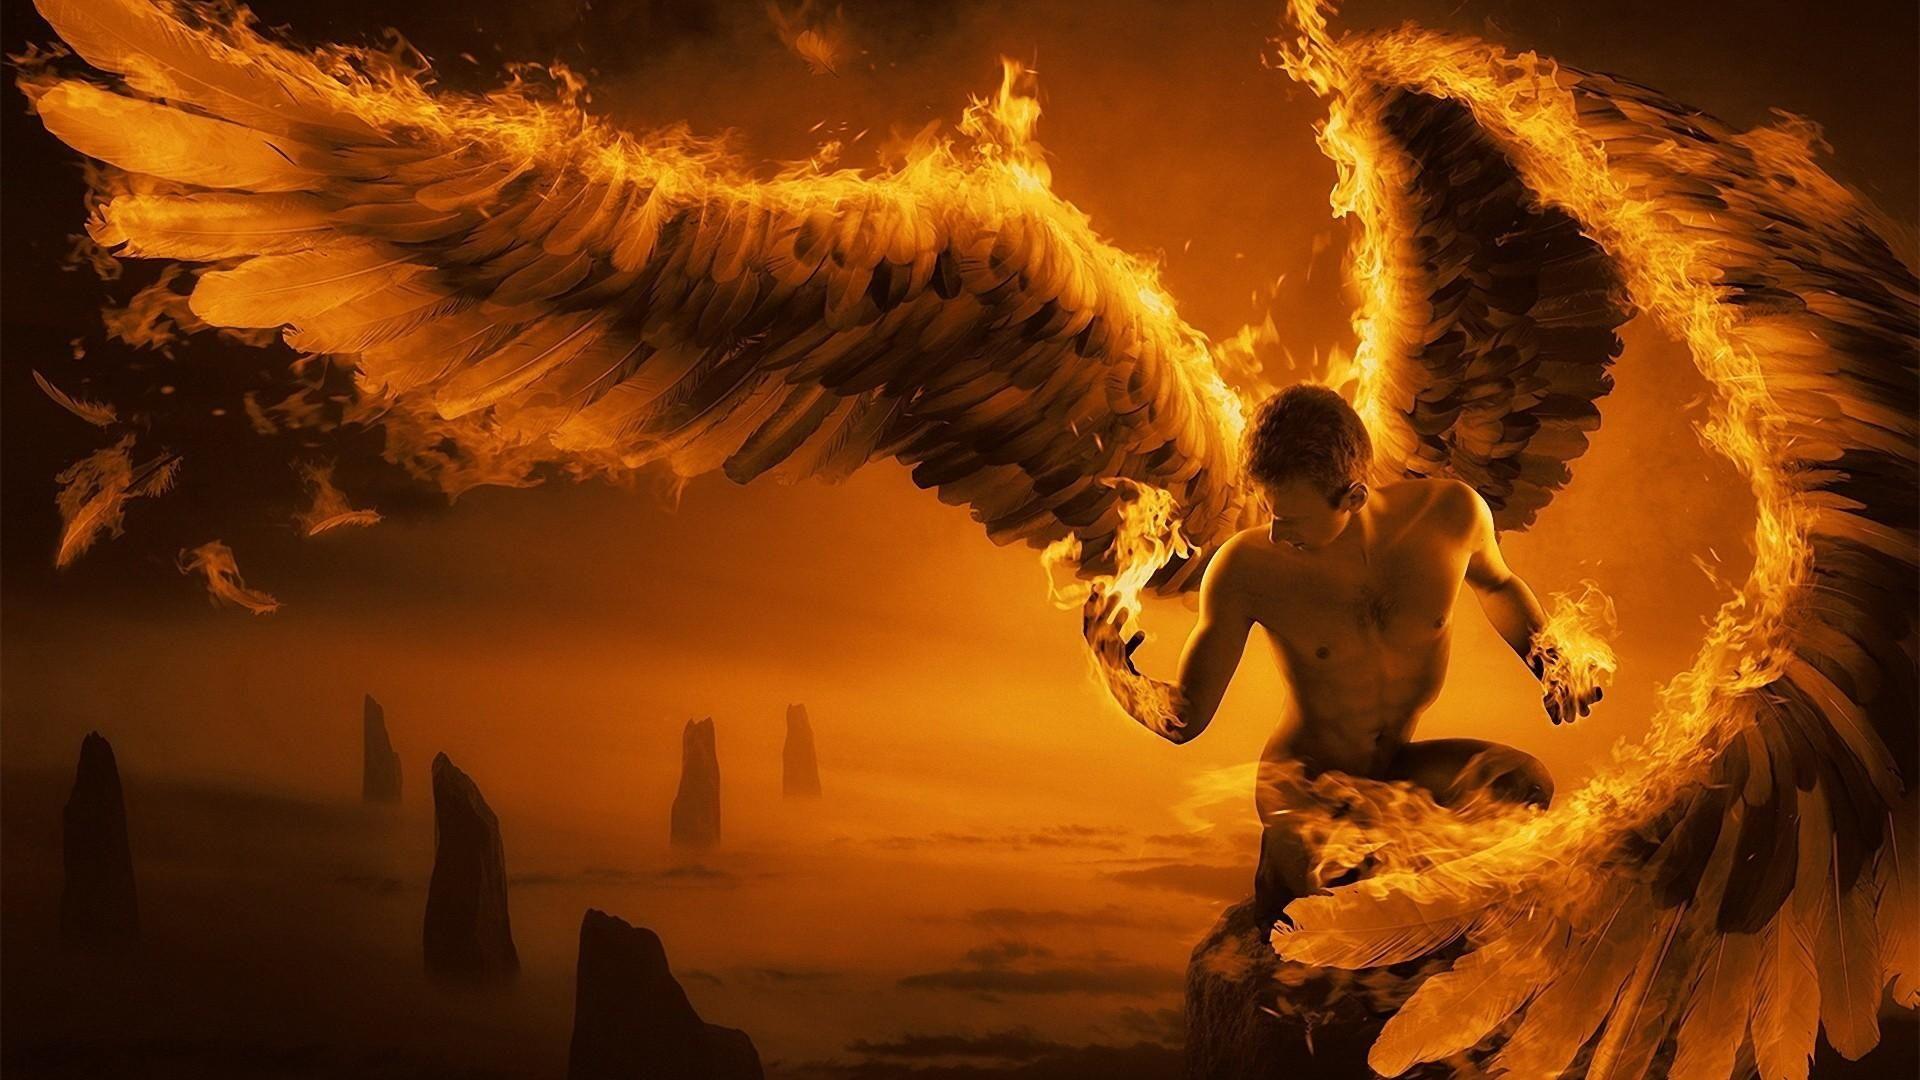 Full HD 1080p Angel Wallpapers HD, Desktop Backgrounds 1920x1080   angels in 2019   Angel ...